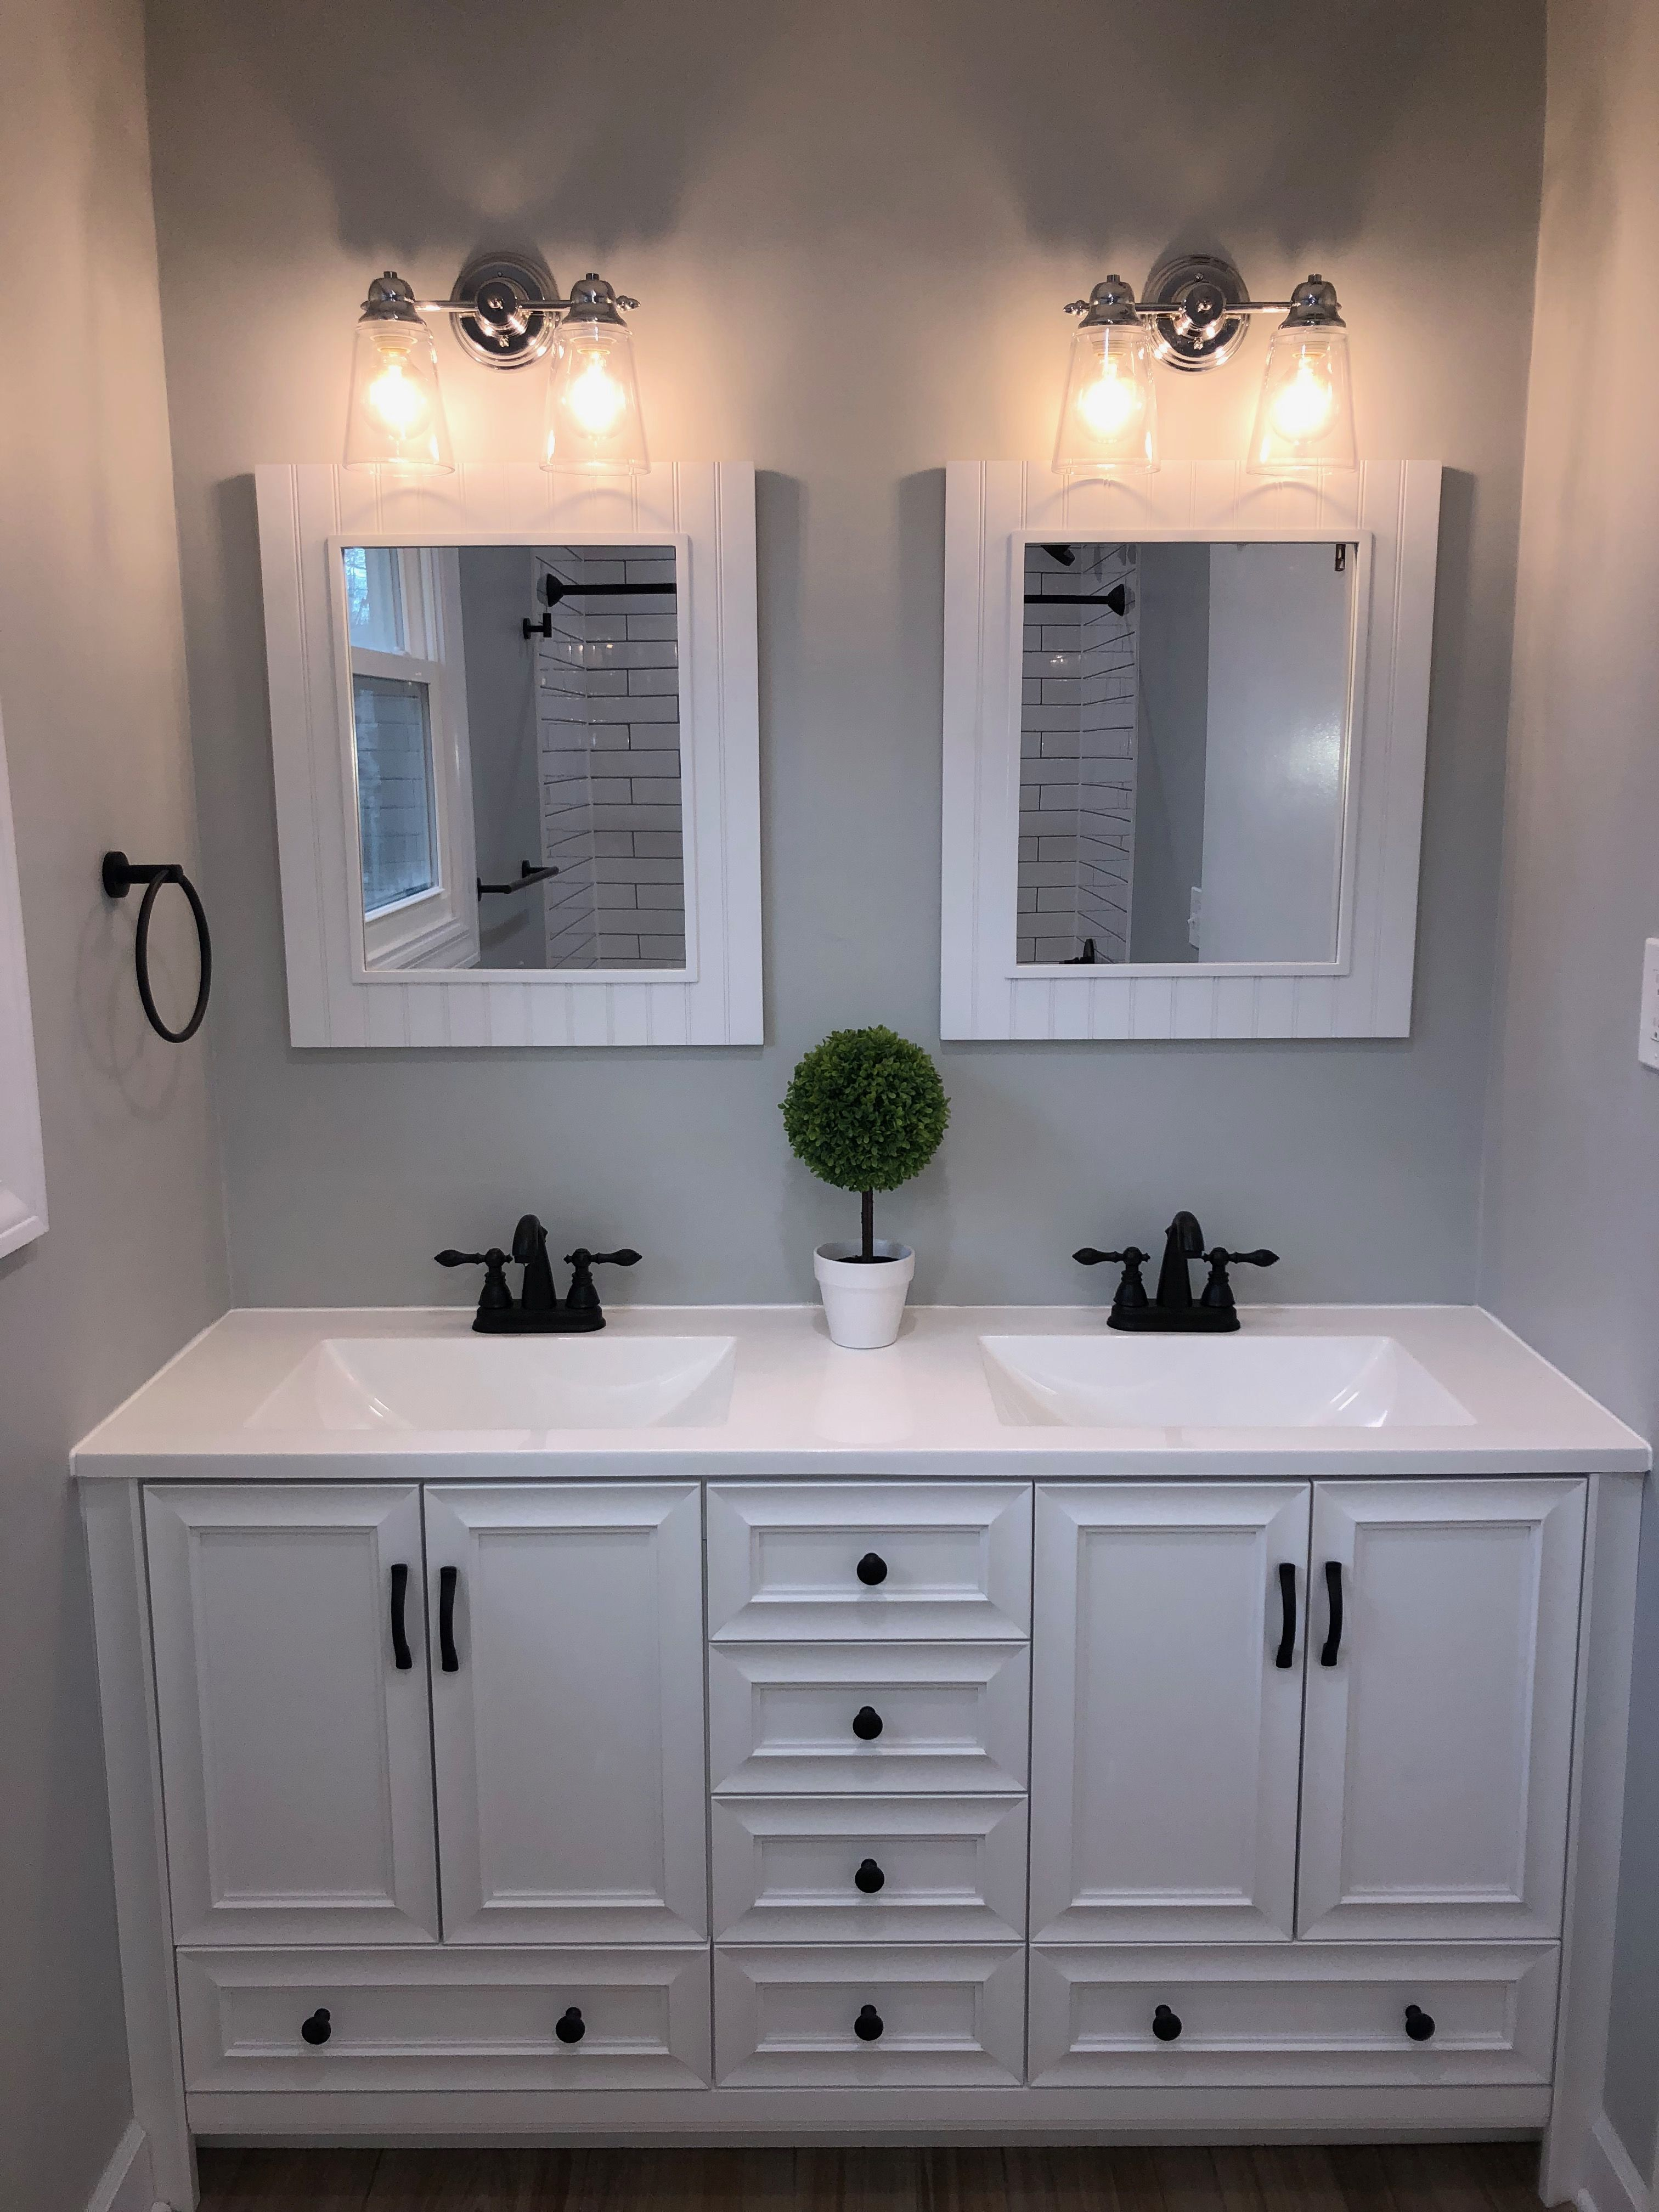 2019 Bathroom Remodel White Vanity Bathroom Gray And White Bathroom Home Depot Vanity